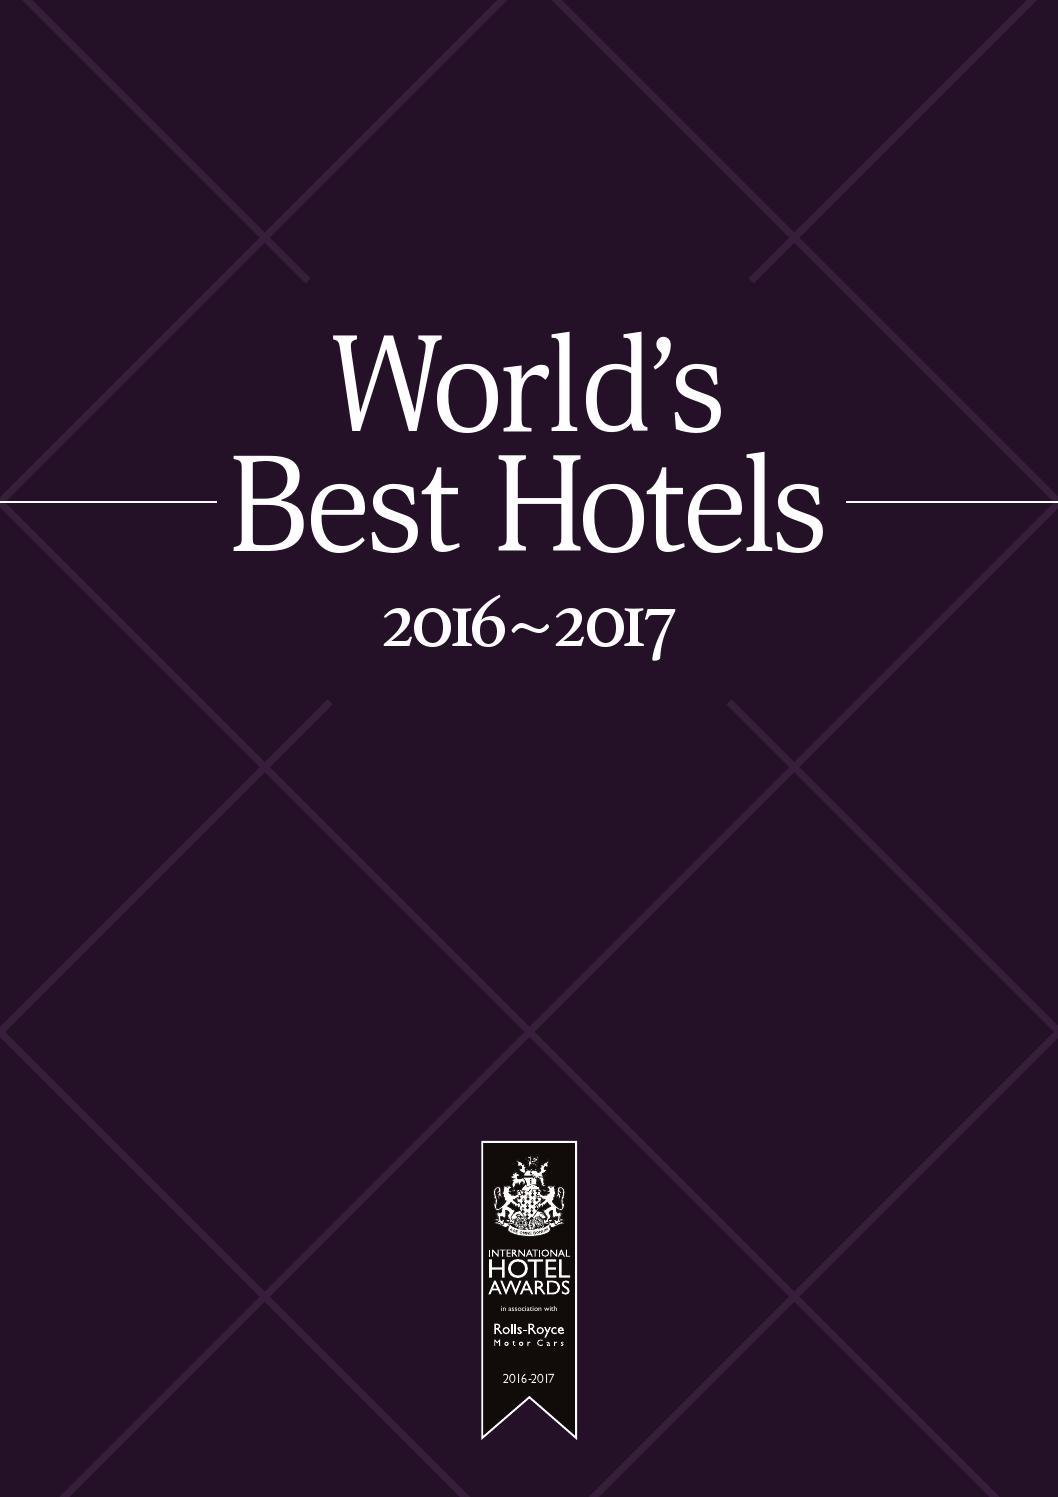 worlds best hotels 2016 2017 by international property media issuu